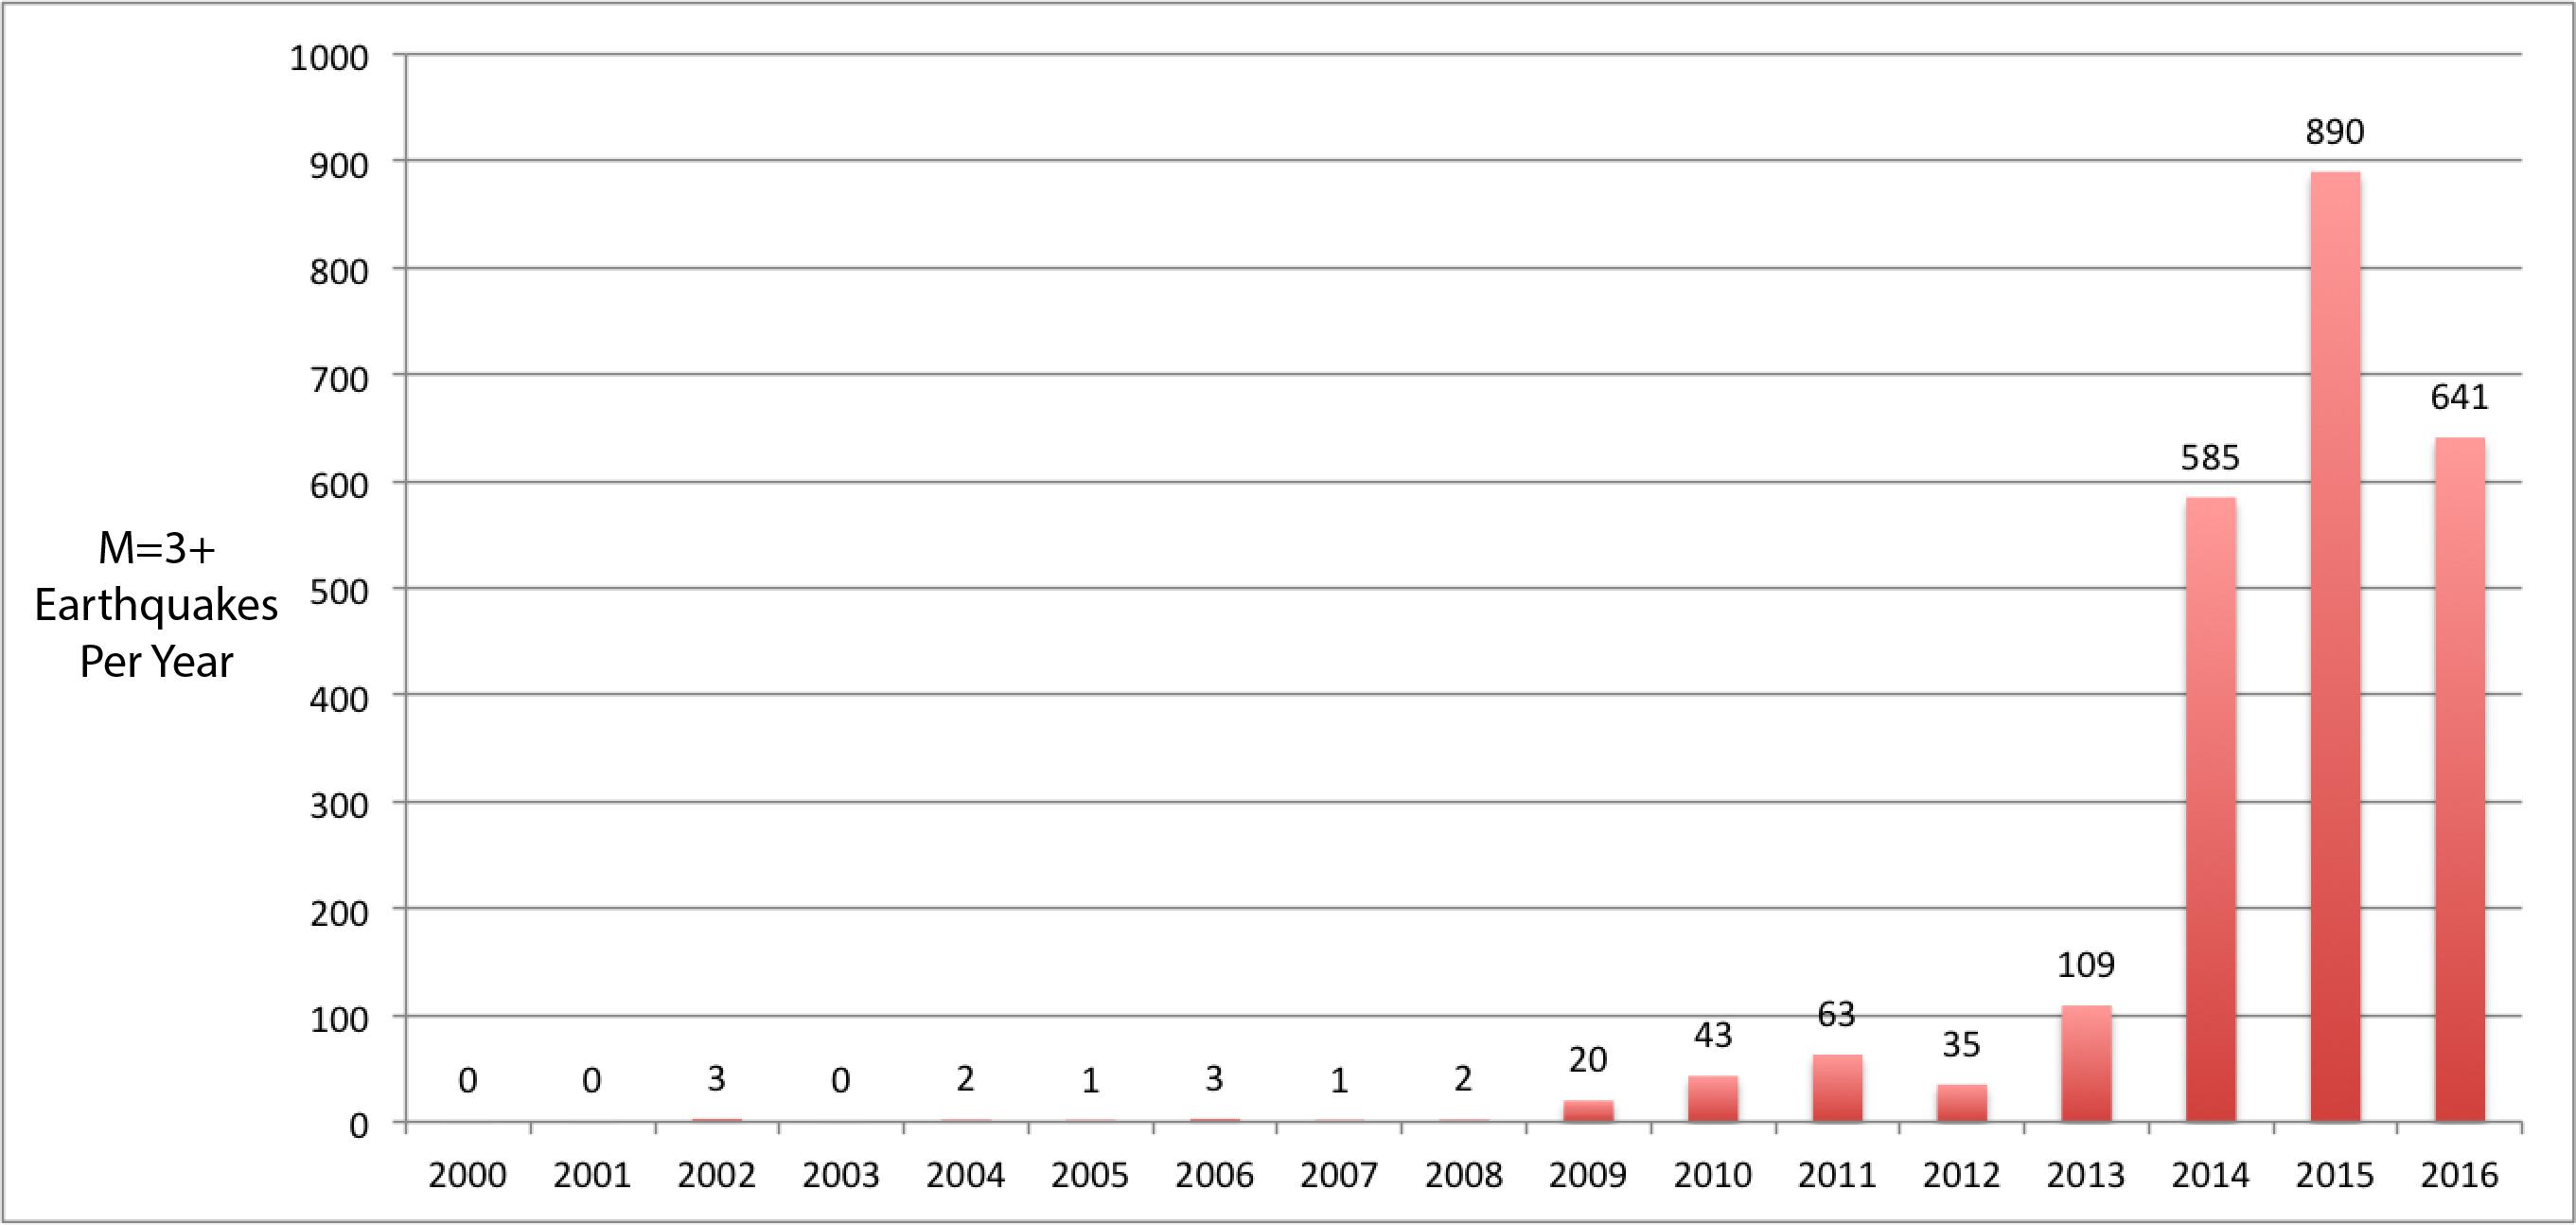 oklahoma-earthquakes-per-year